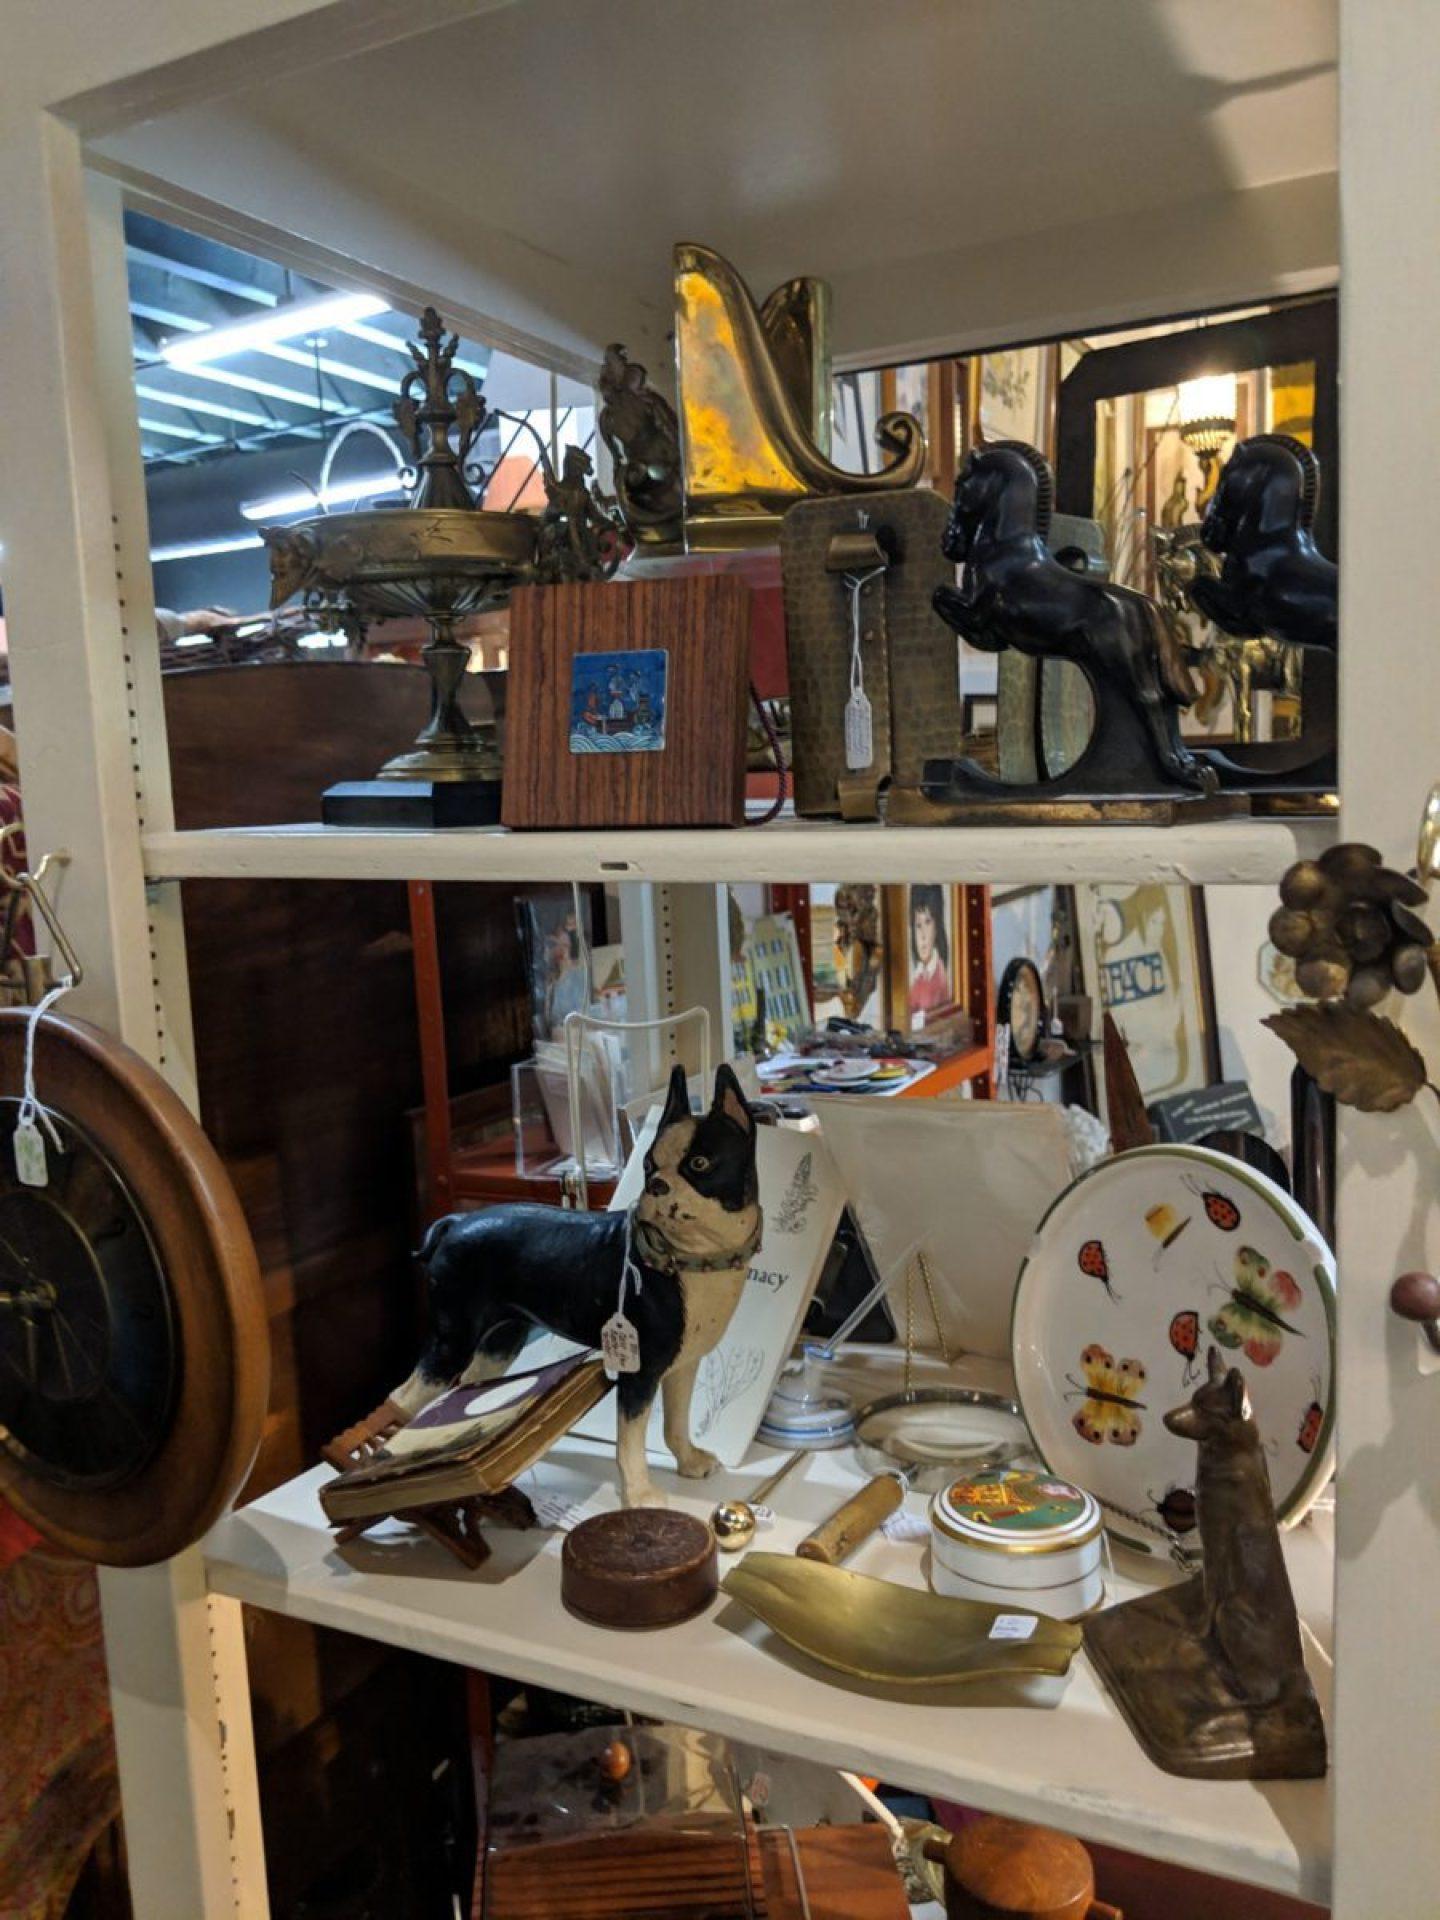 IMG_20190505_144625-1440x1920 Arkansas Delta Family Road Trip:  Black Heritage, Art & More!